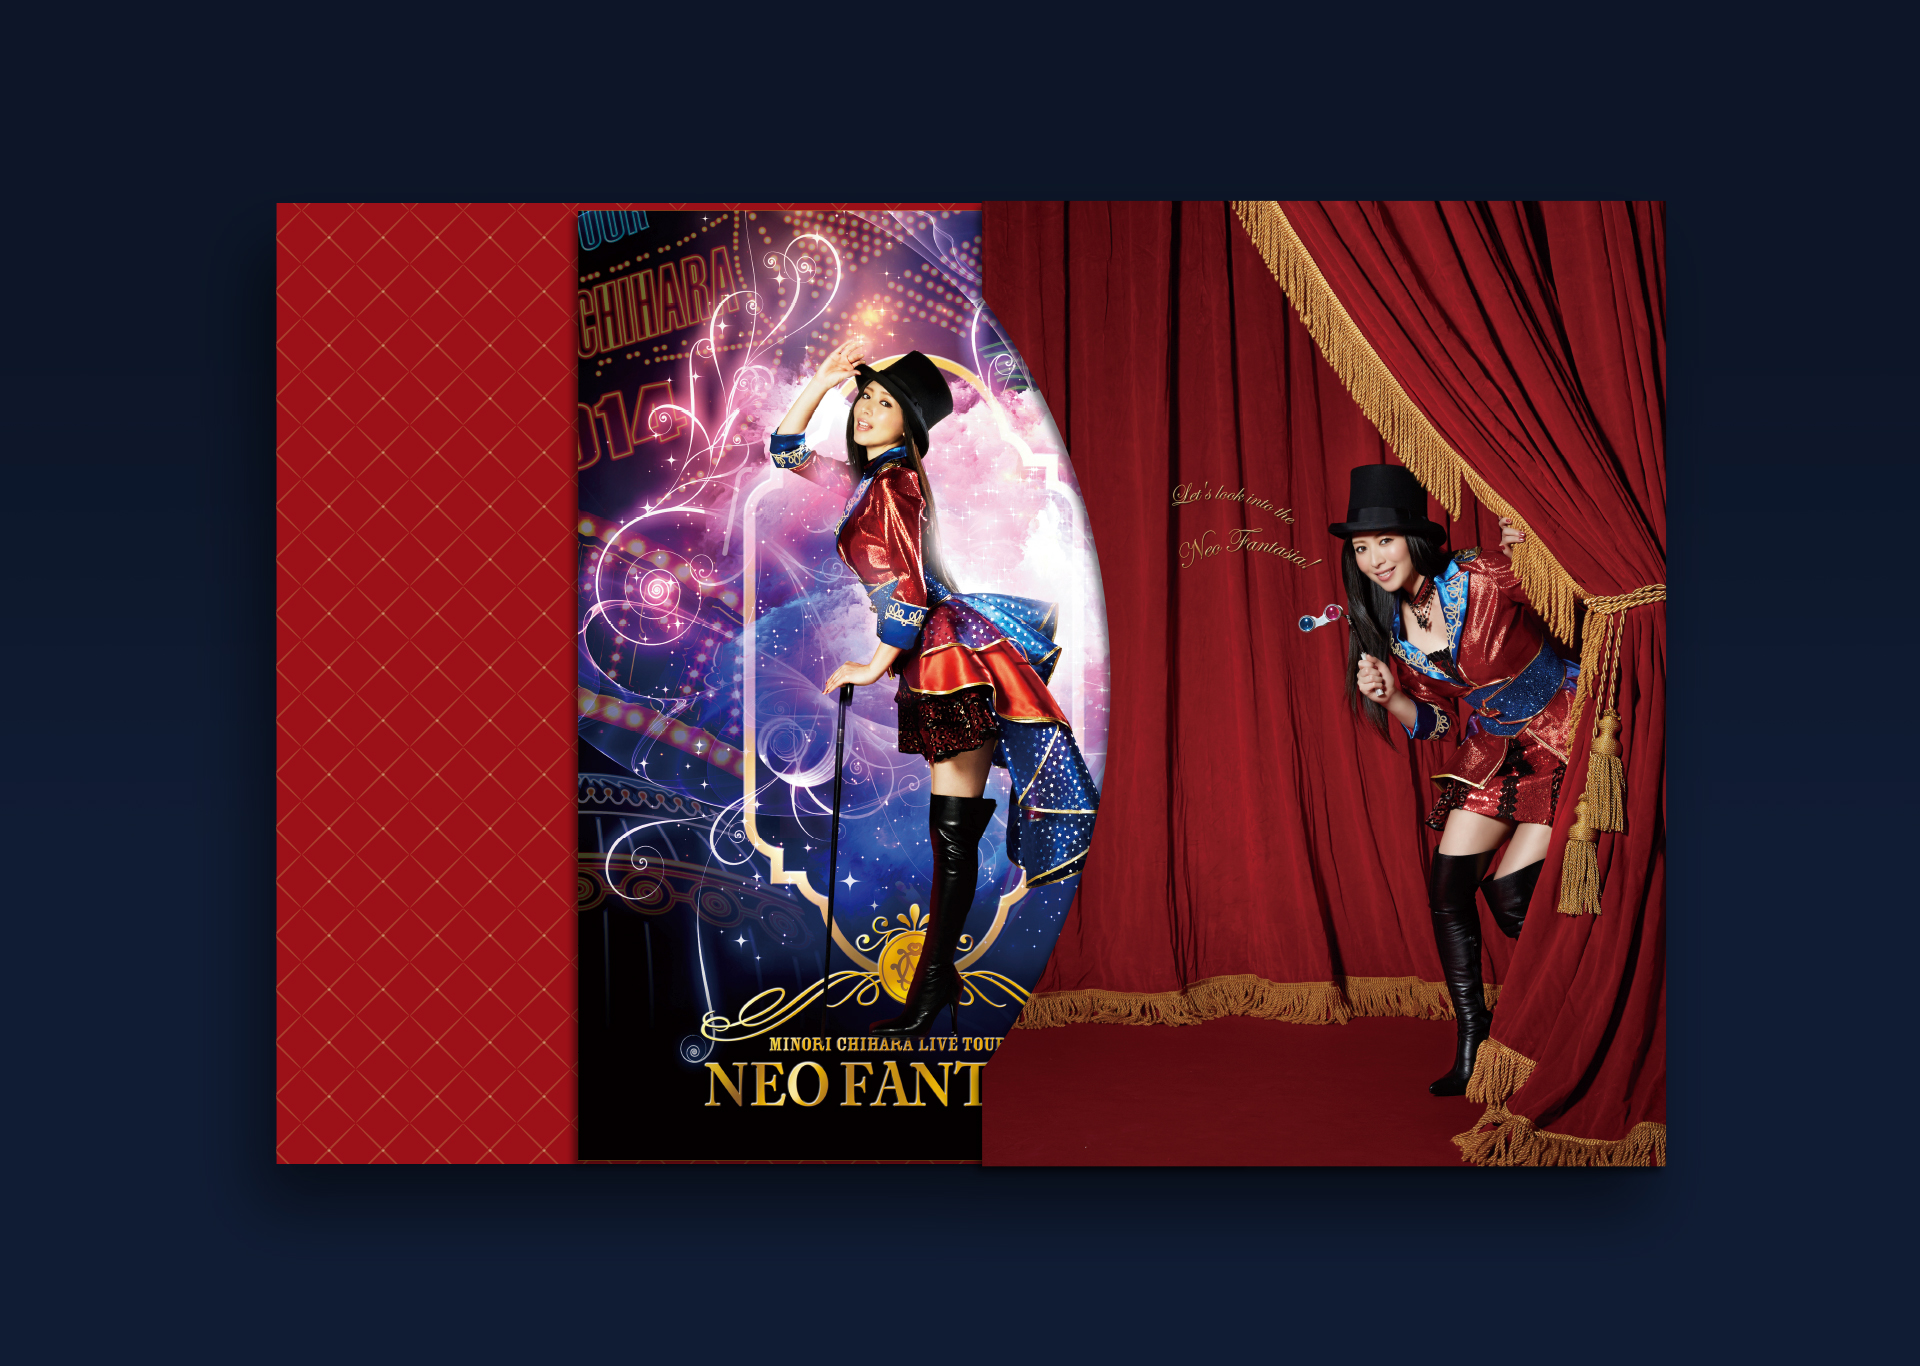 Minori Chihara Live Tour 2014 ~NEO FANTASIA~